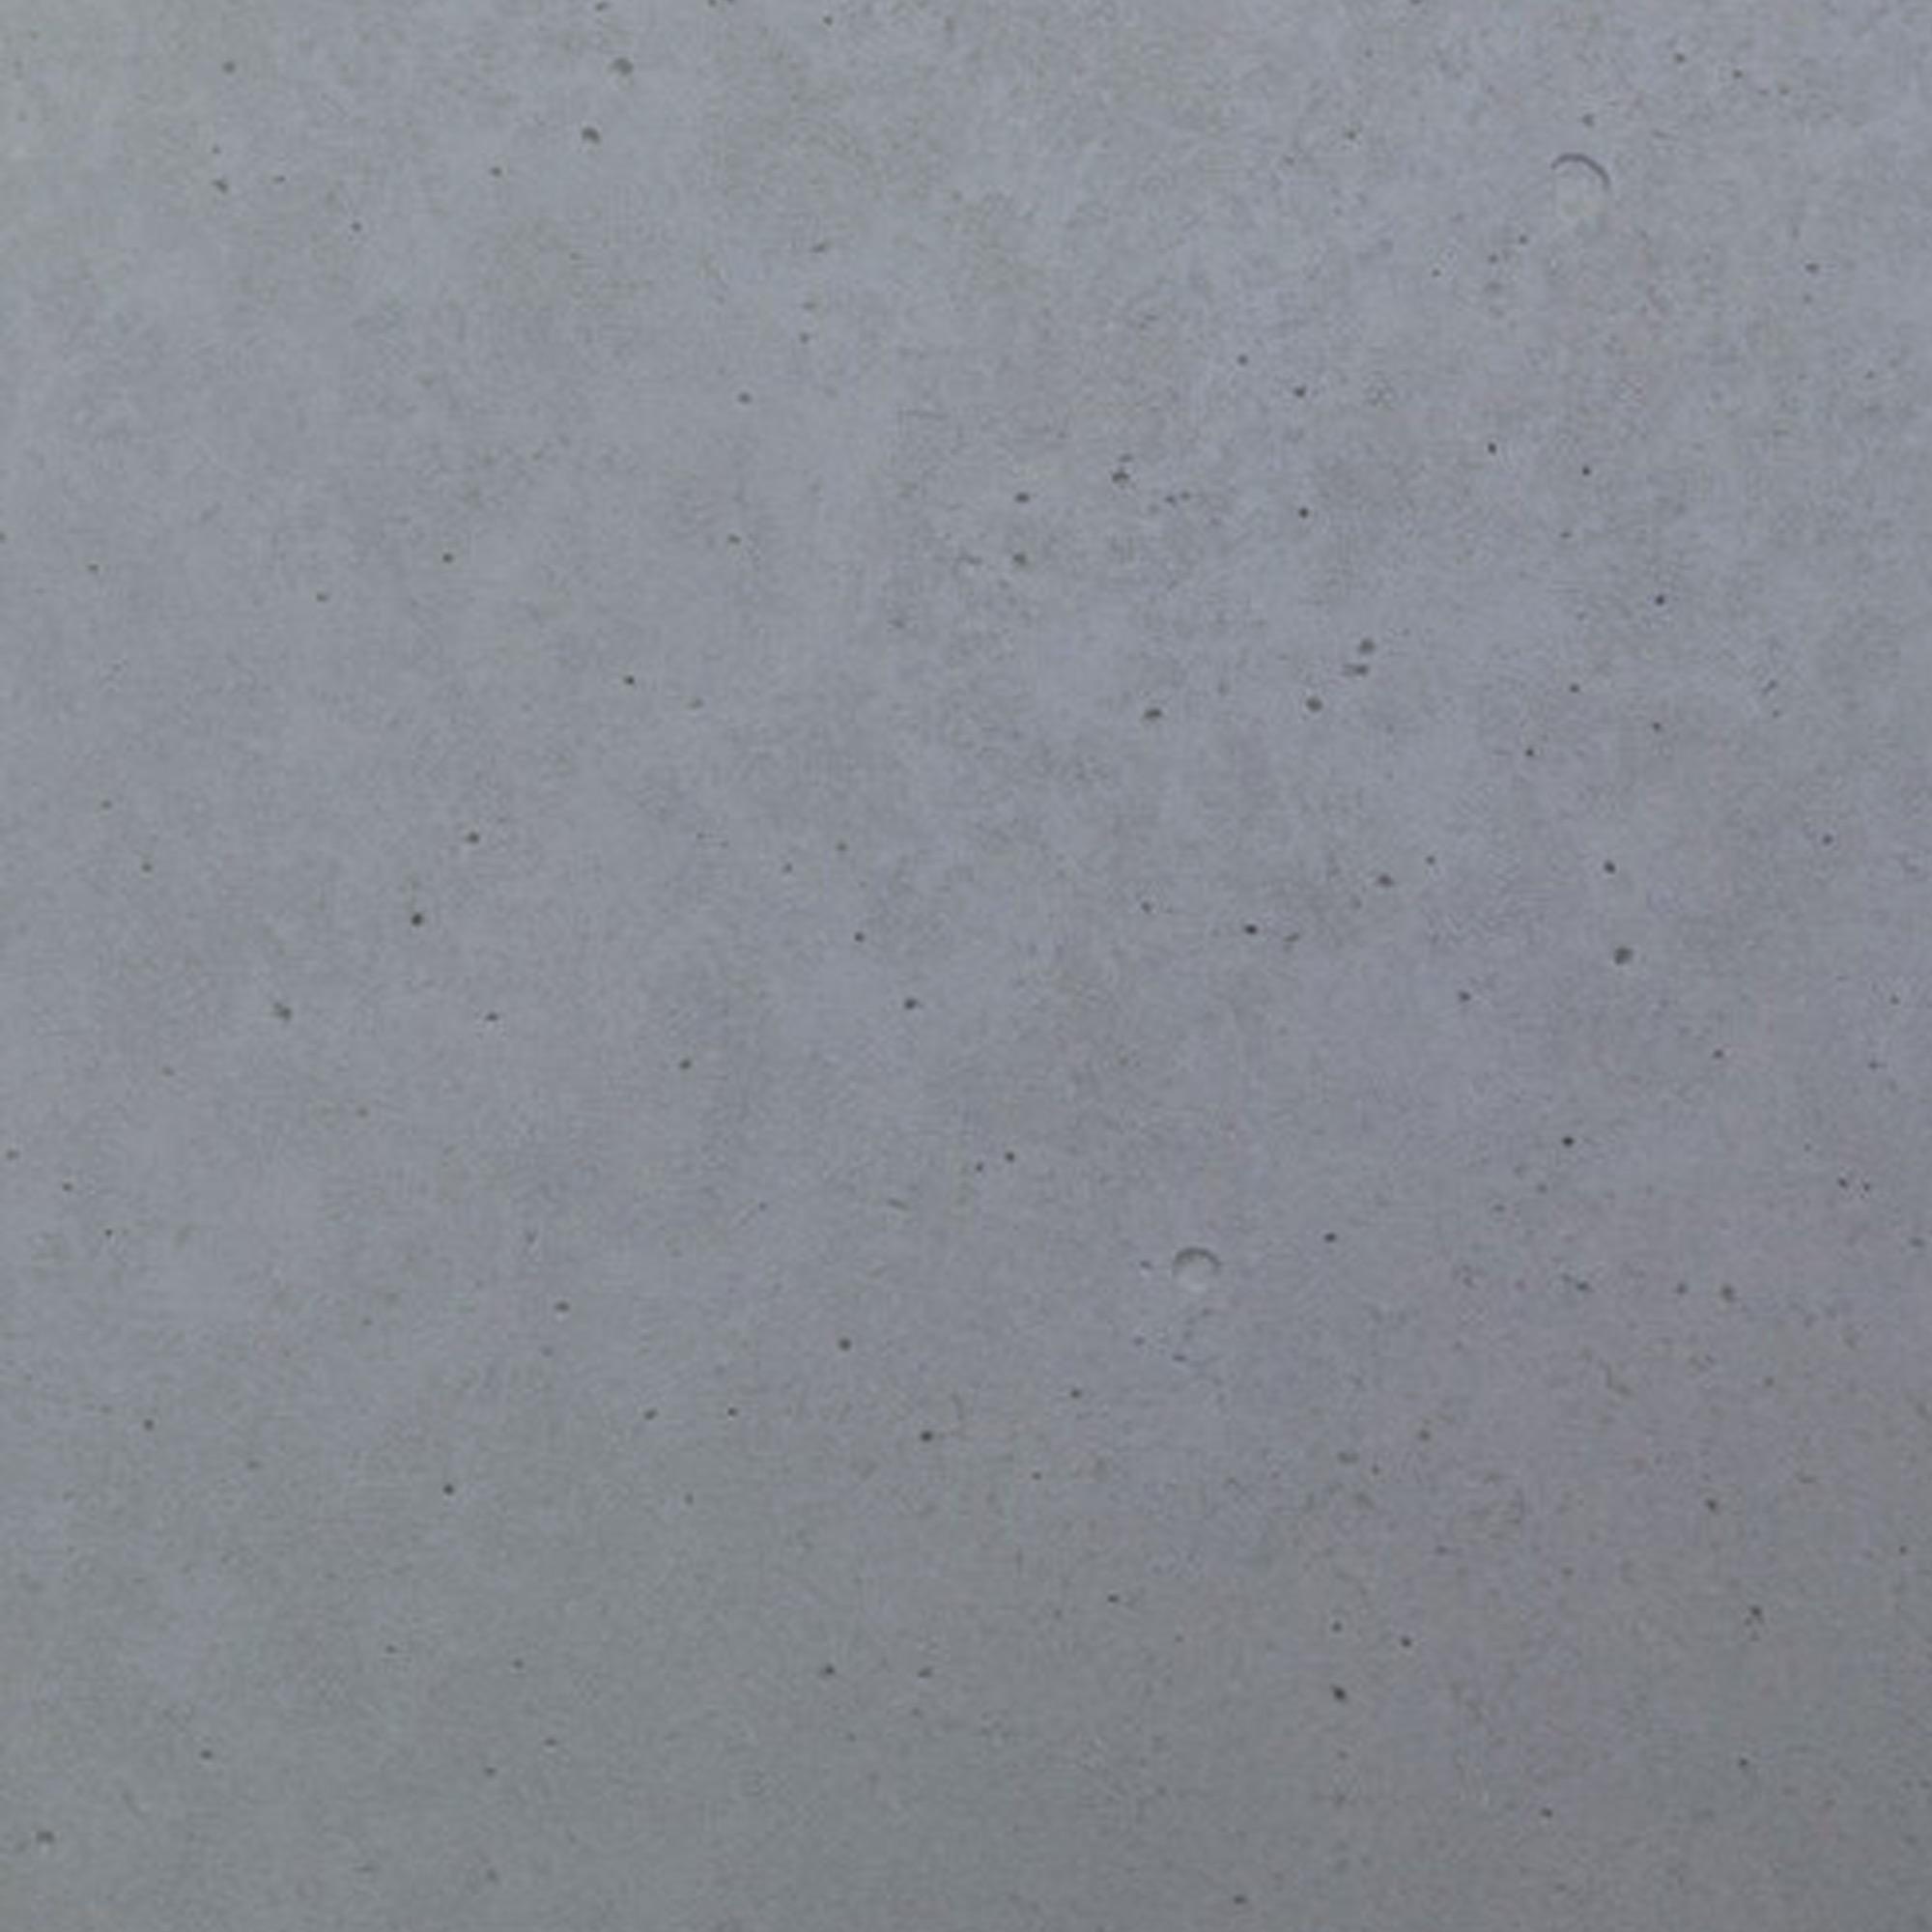 carousel-conclad-finiture-cipria-4.jpg